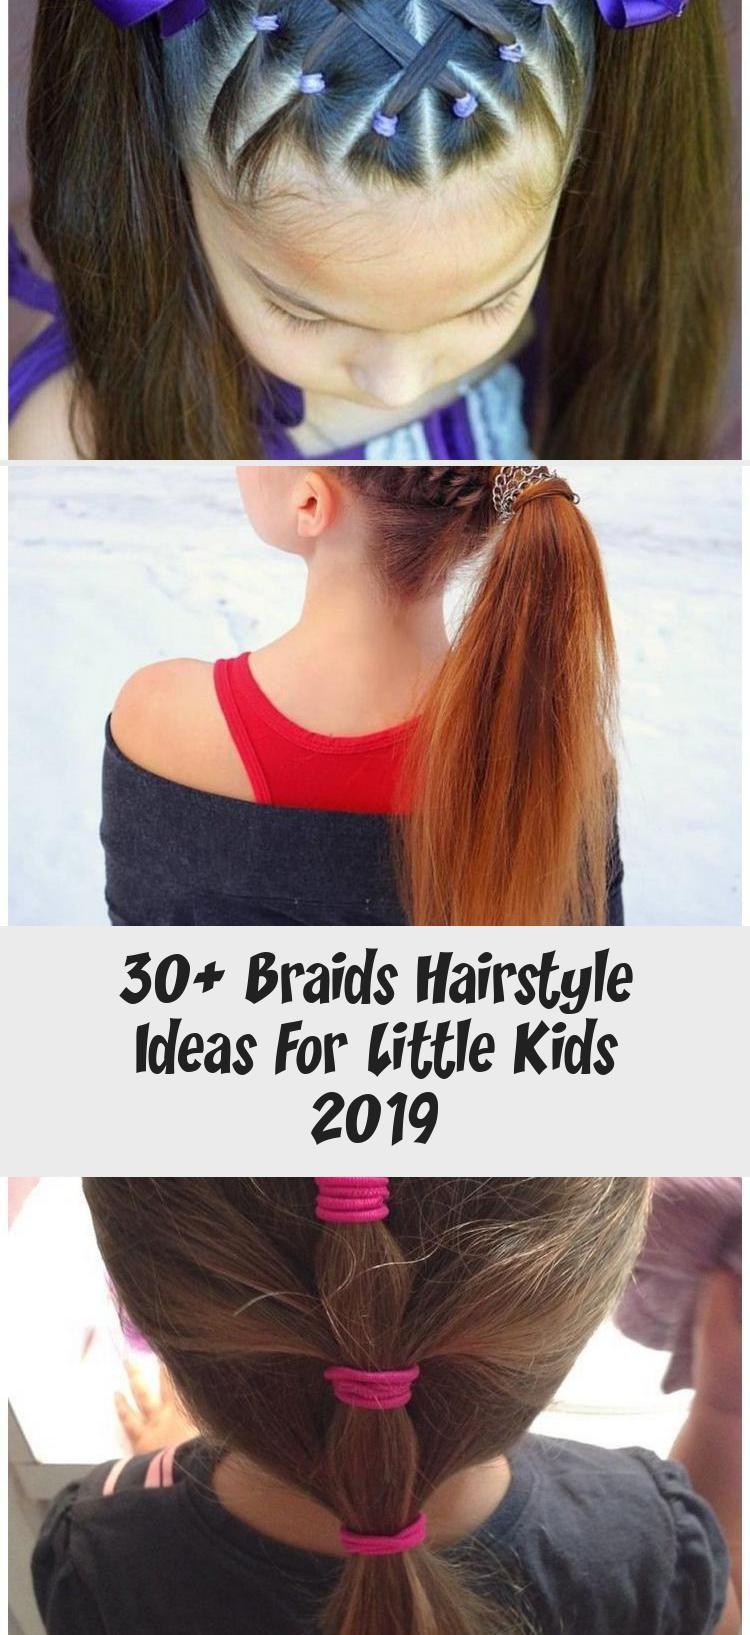 Finding Braids Hairstyle Ideas for Little Kids Online Braids